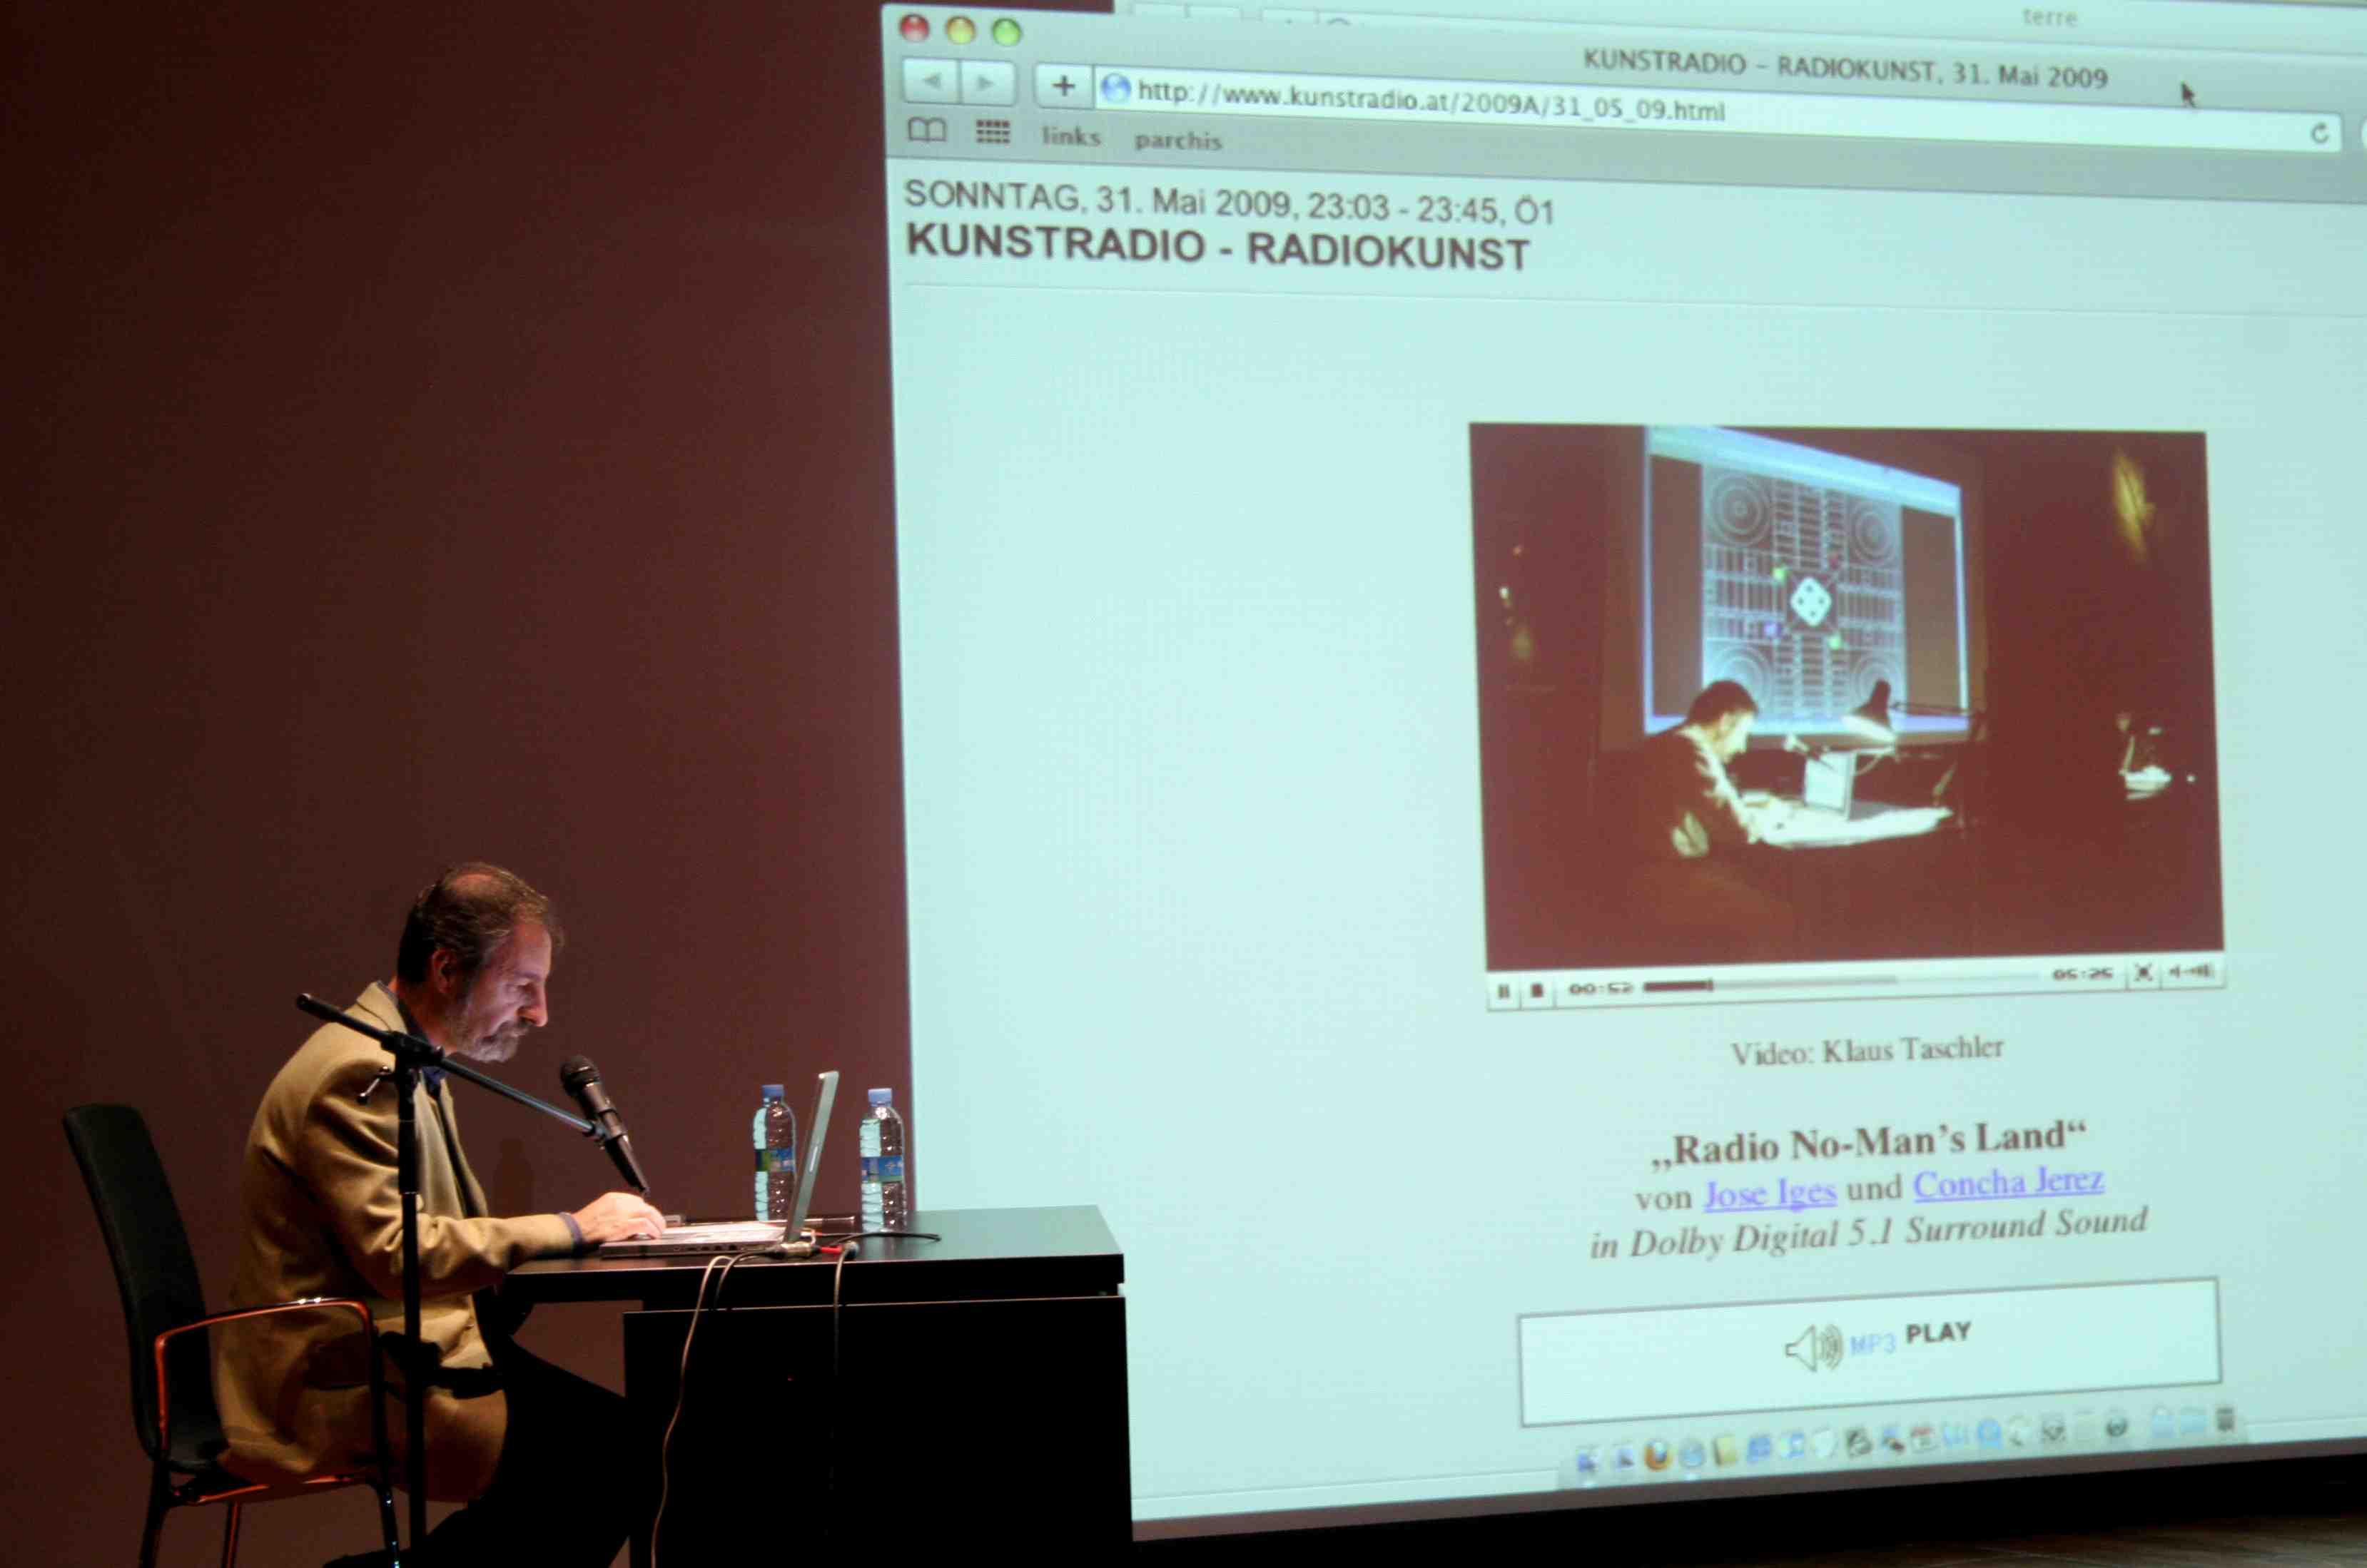 Concha Jerez + José Iges: Radio No-Man's Land